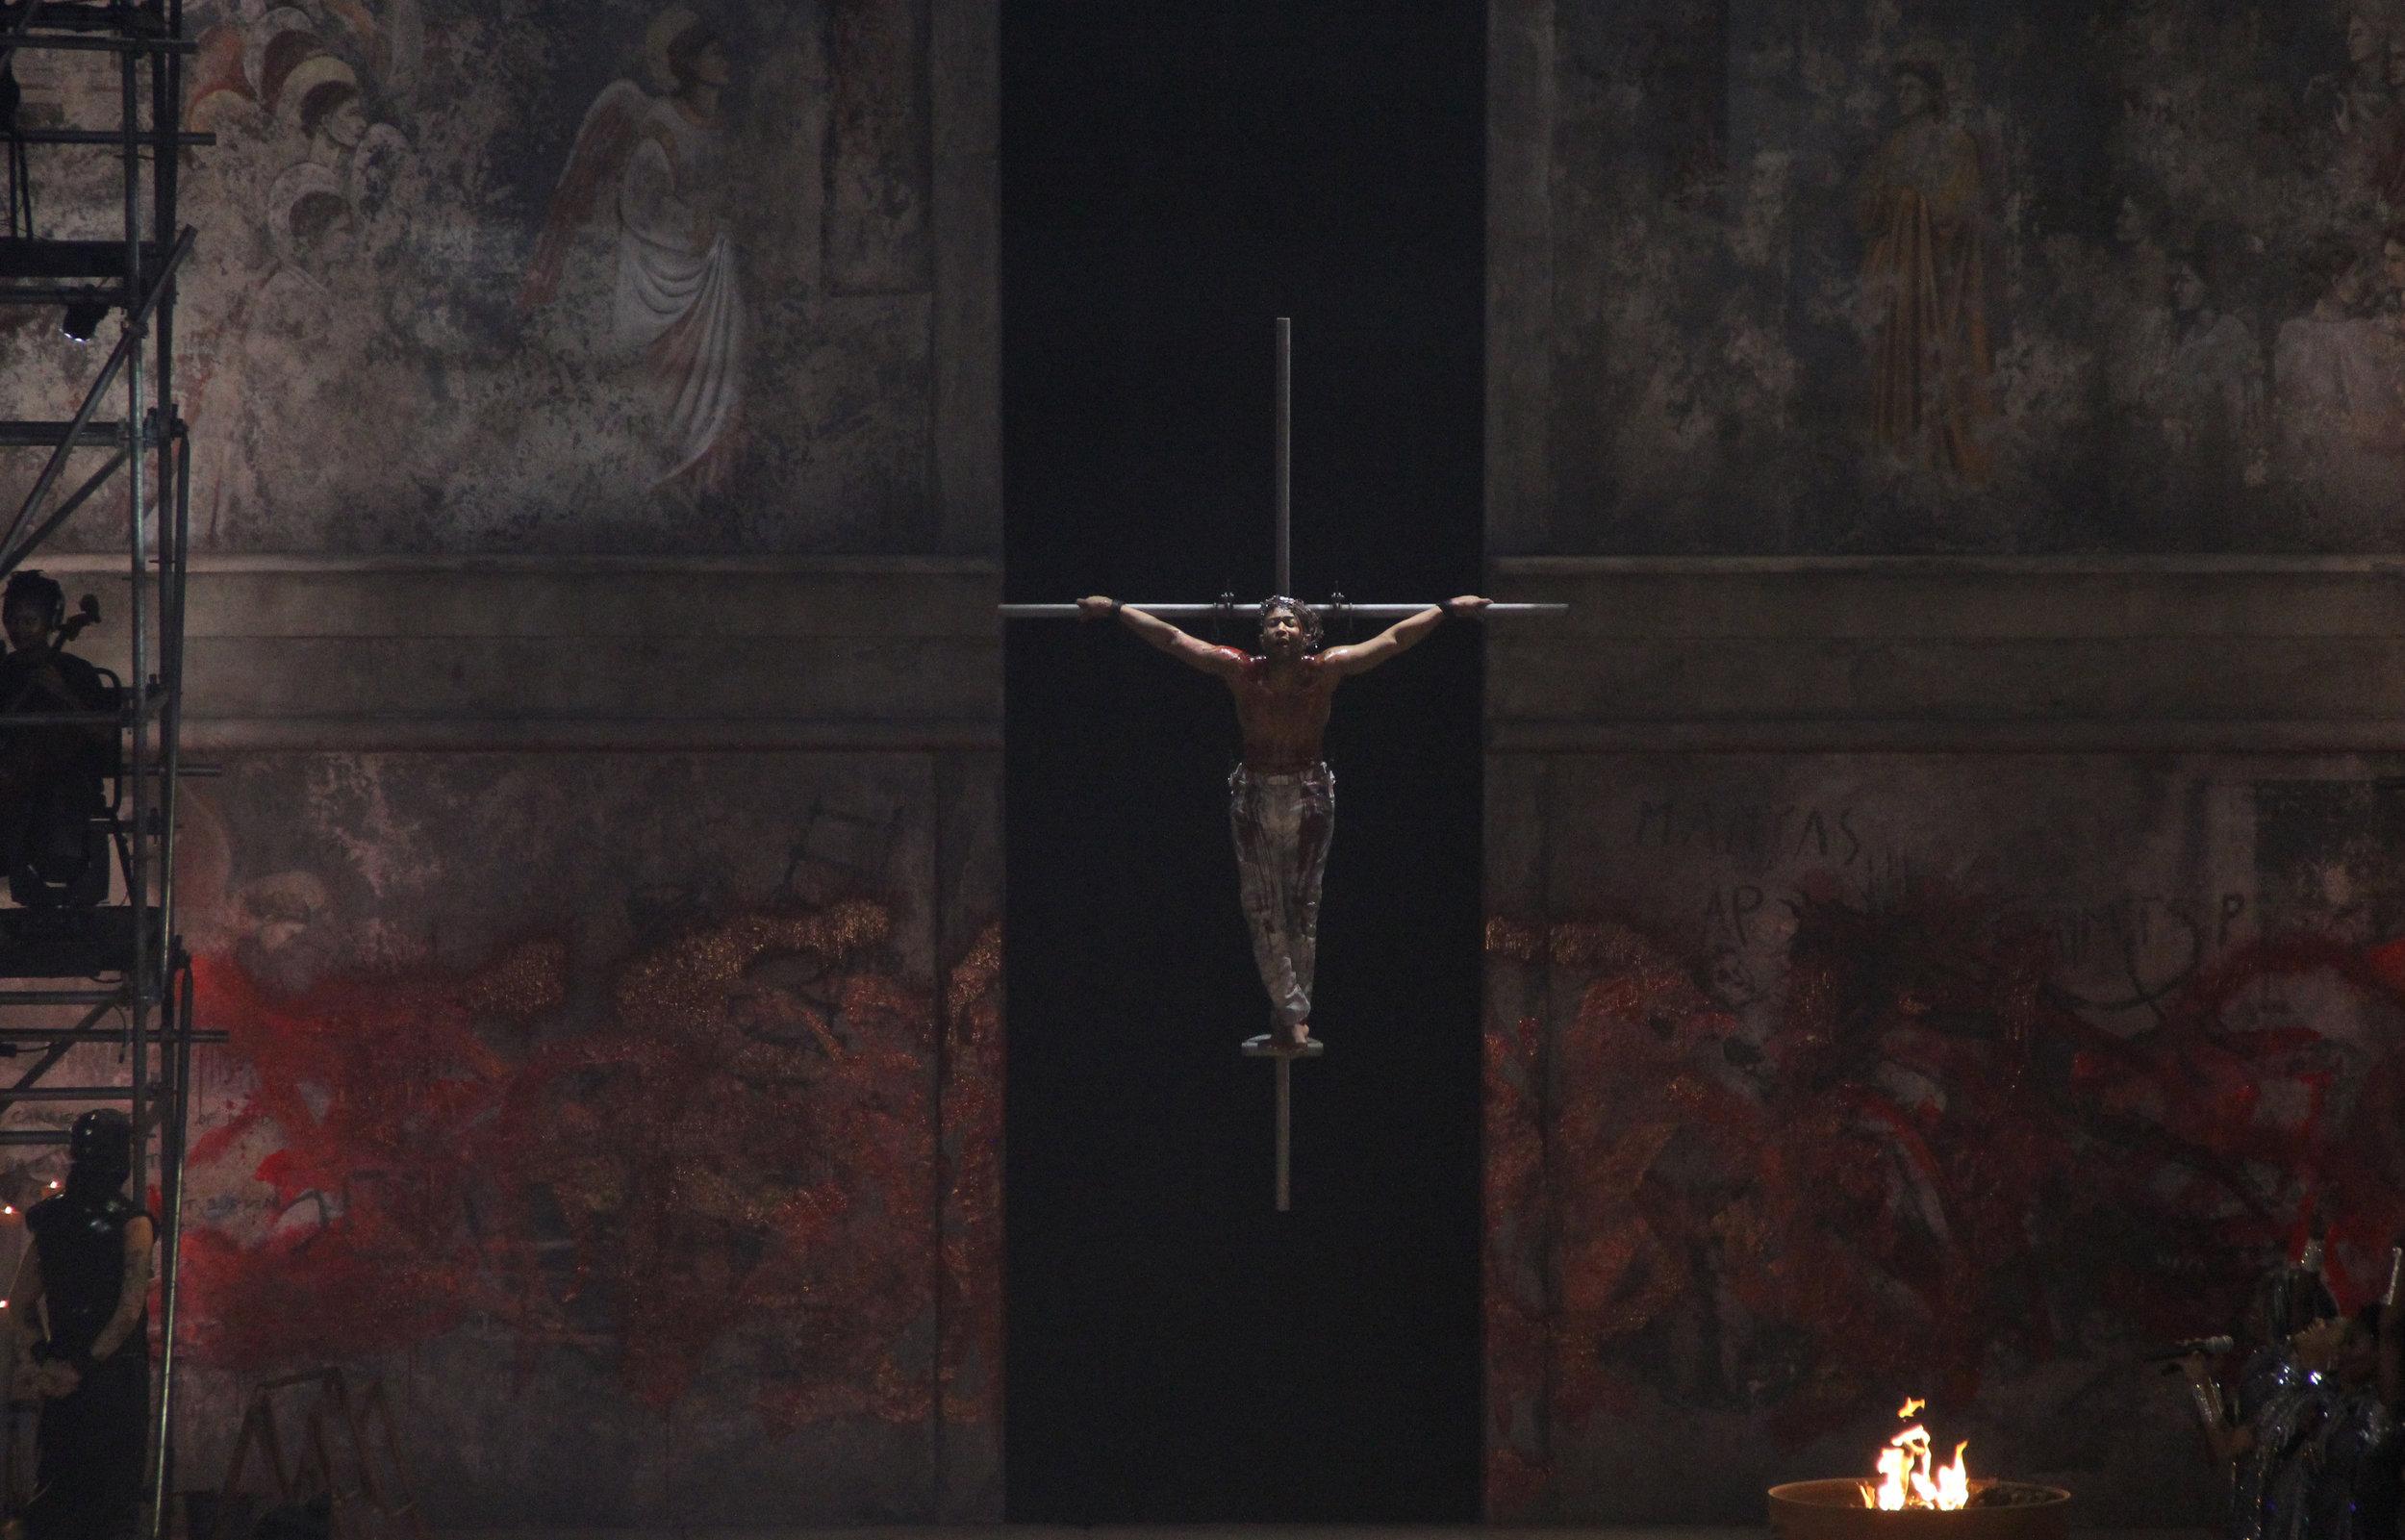 Jesus-Christ-Superstar-Act-10-Crucifixion-01.jpg